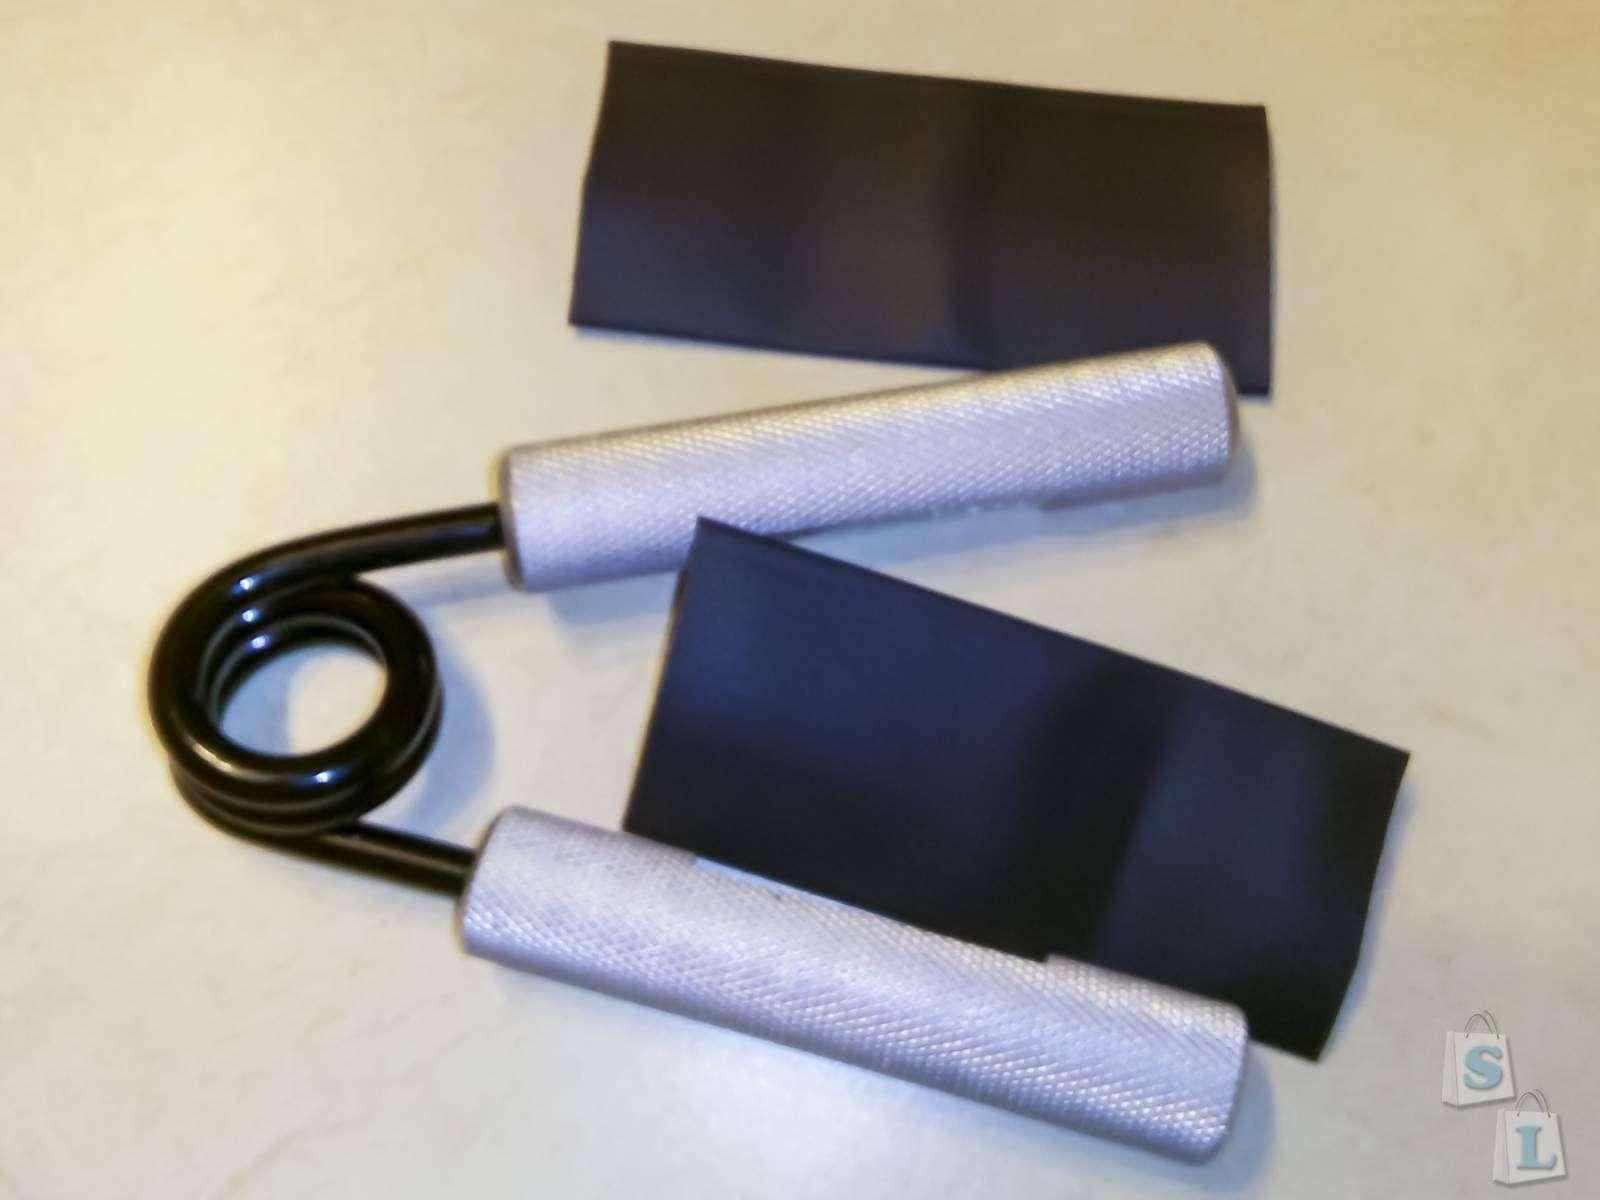 Aliexpress: Кистевой эспандер на 200 фунтов (90кг)